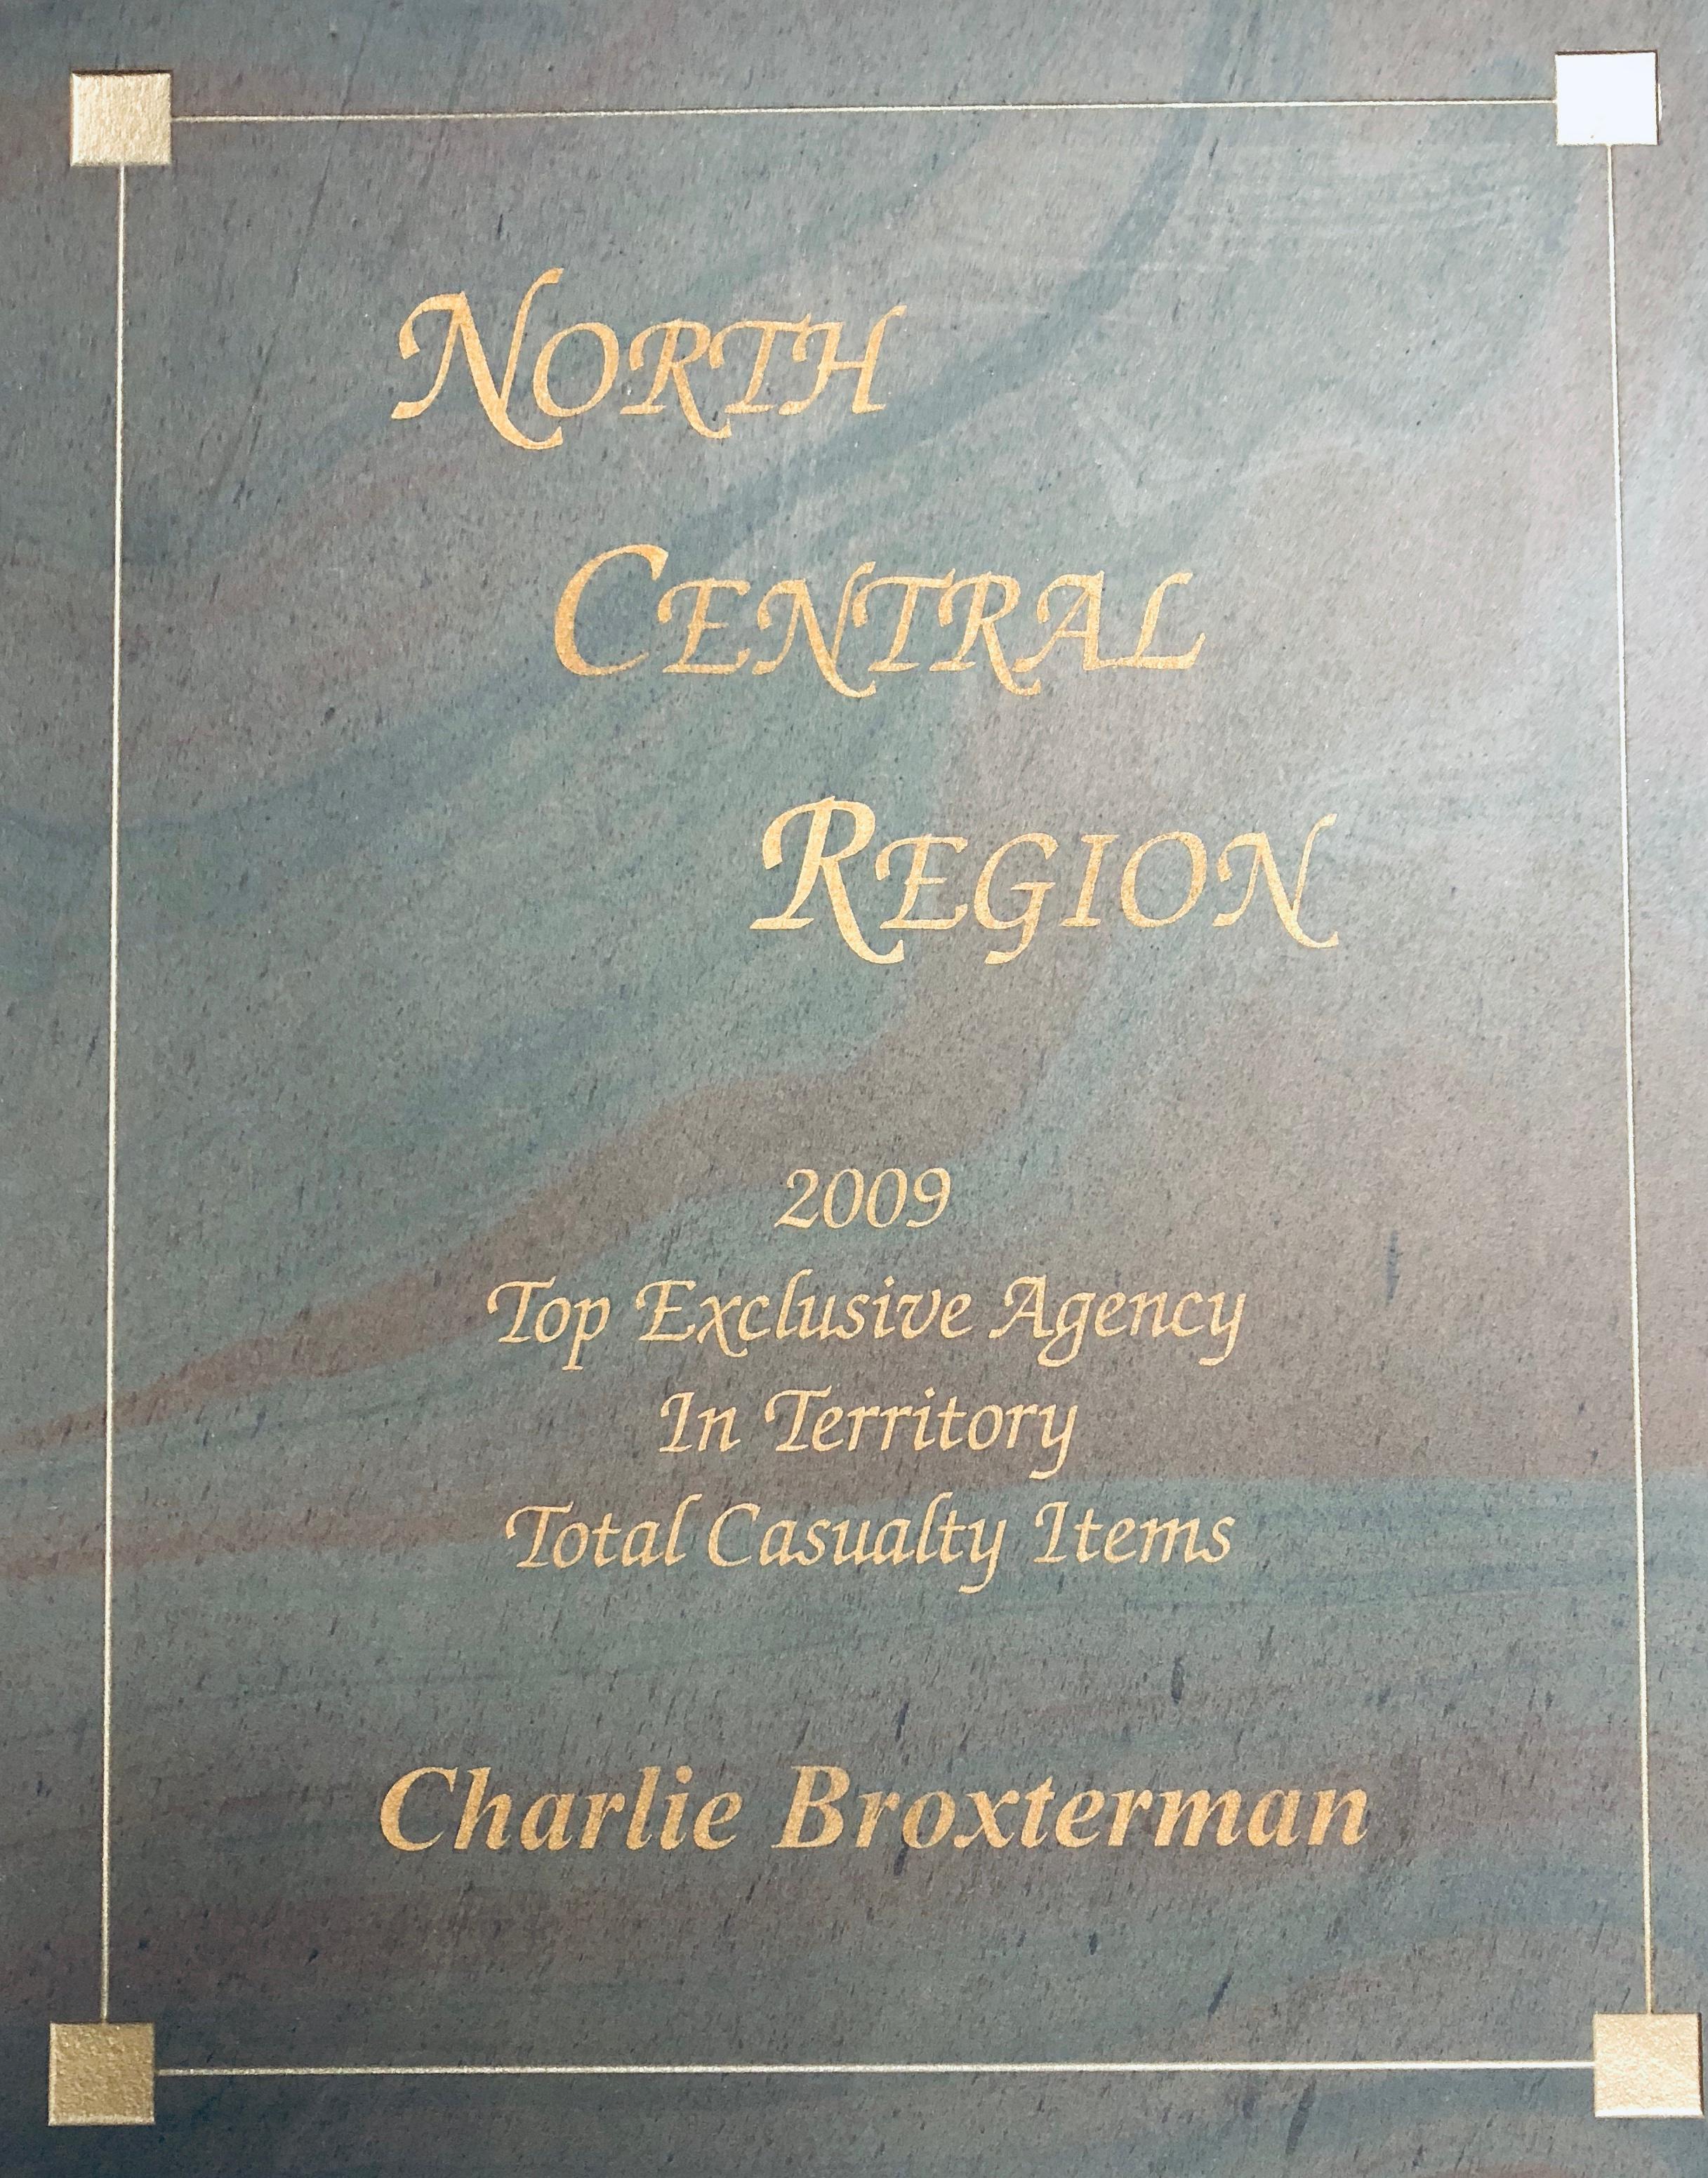 Charlie Broxterman: Allstate Insurance image 10